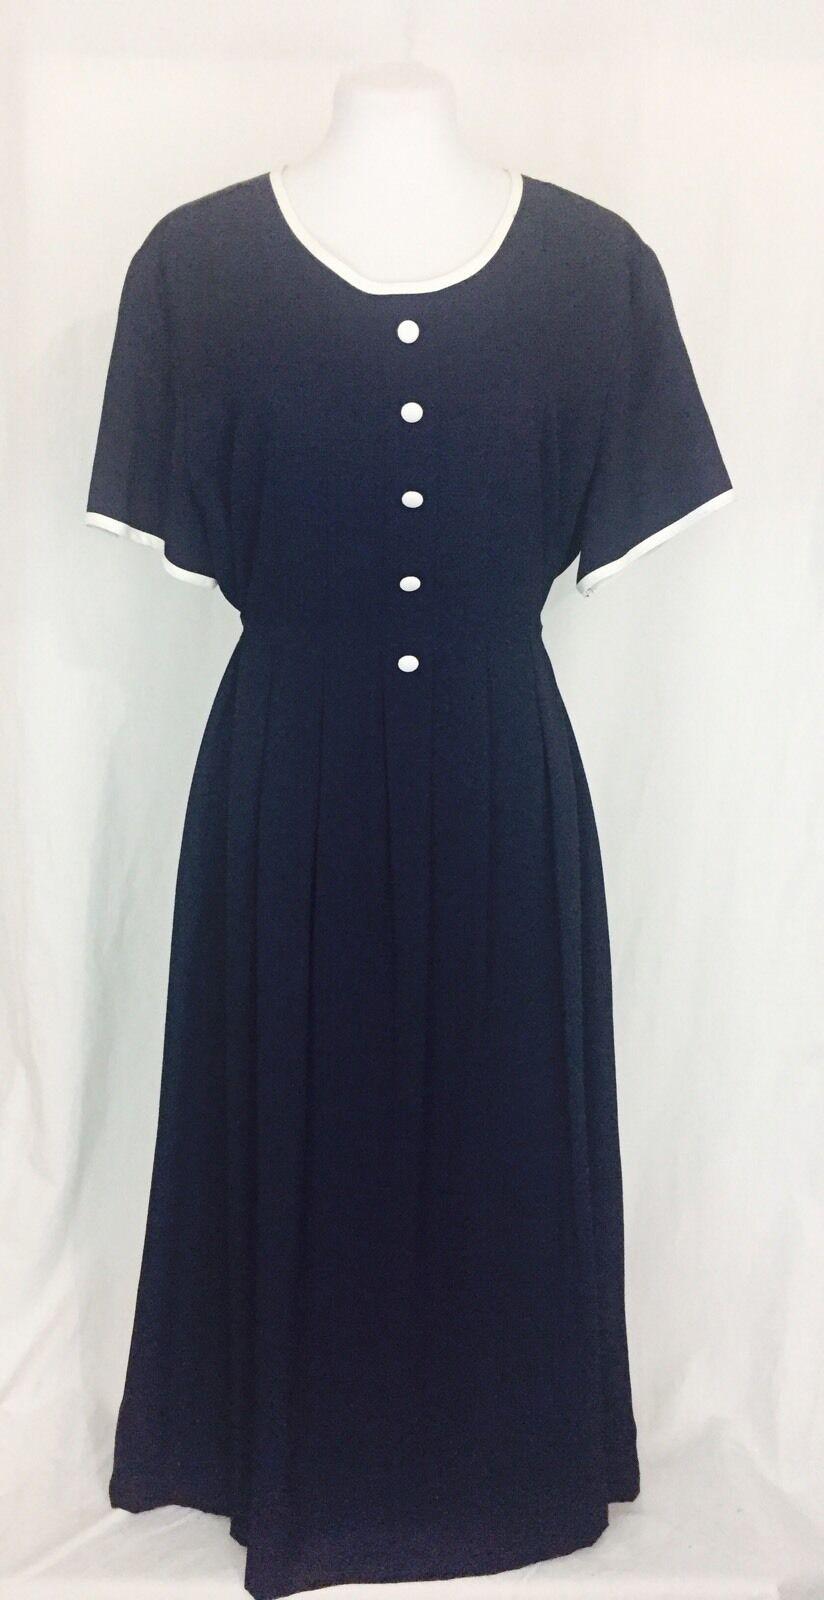 Vintage 1980's Sailor Style Adjustable Maternity Dress XL bluee